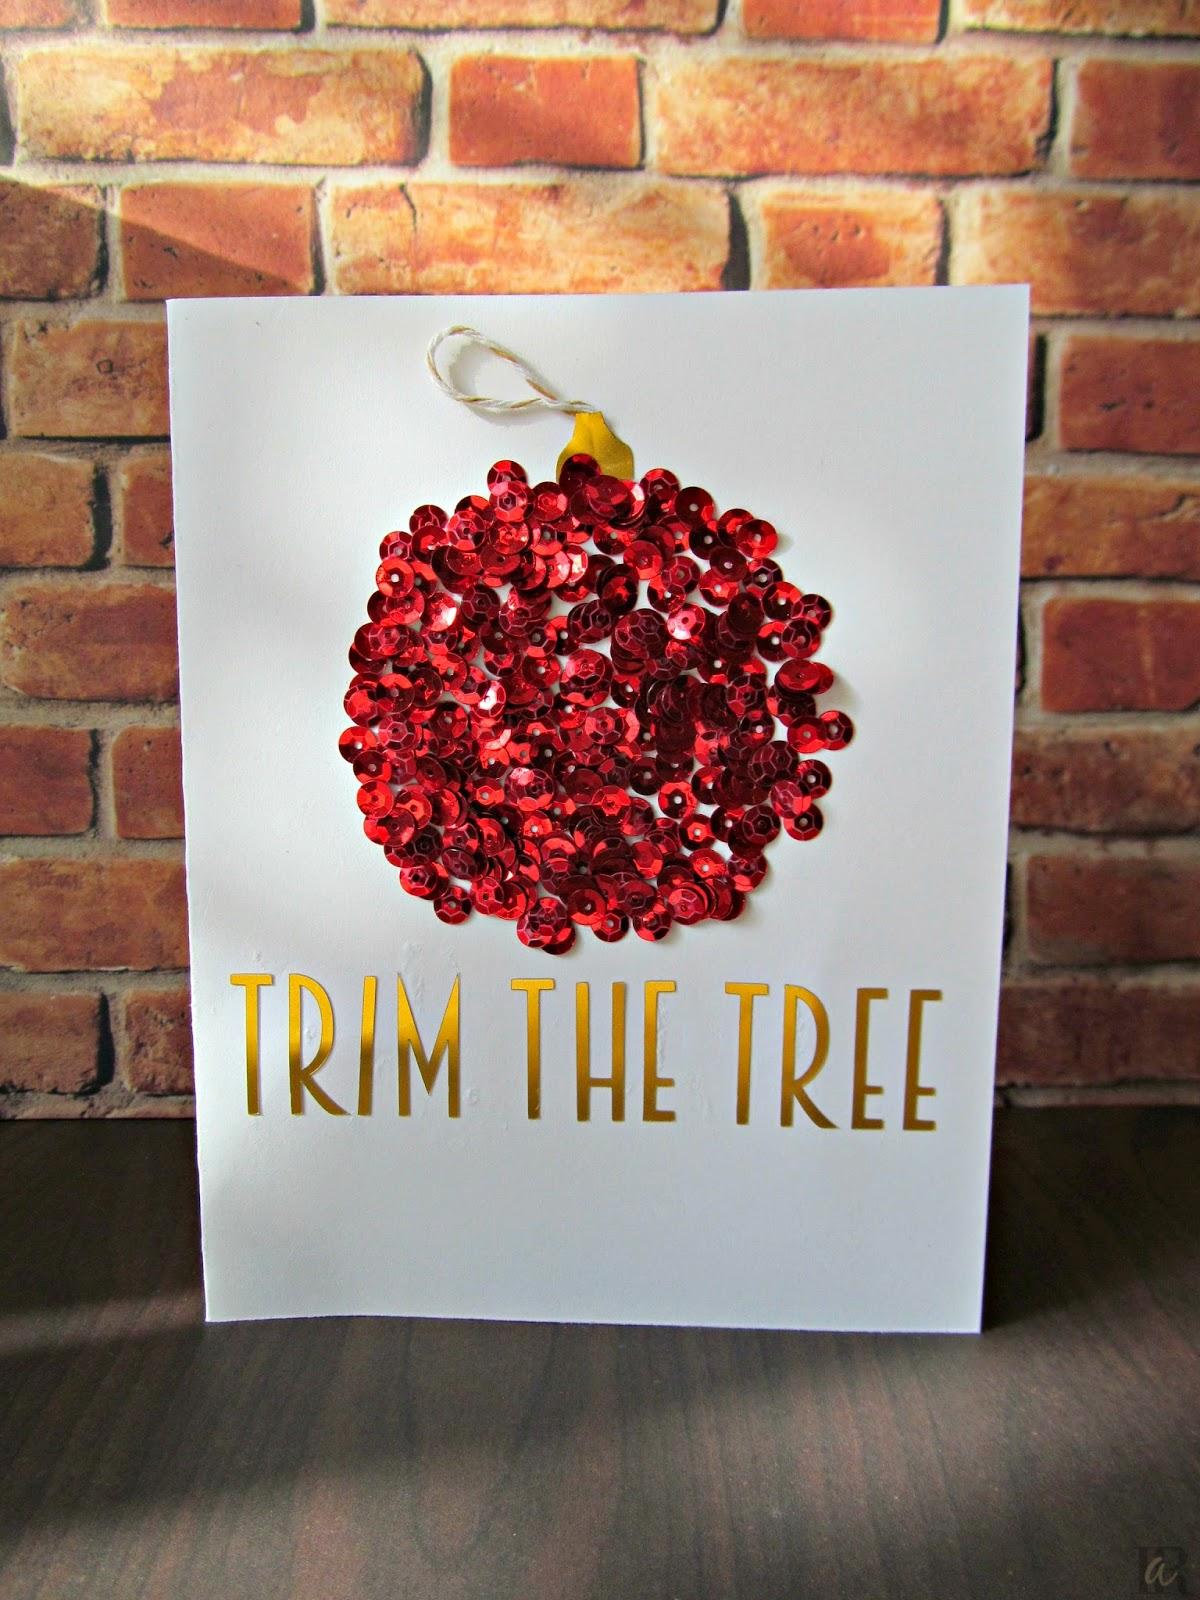 http://itsalwaysruetten.blogspot.com/2014/11/trim-tree.html